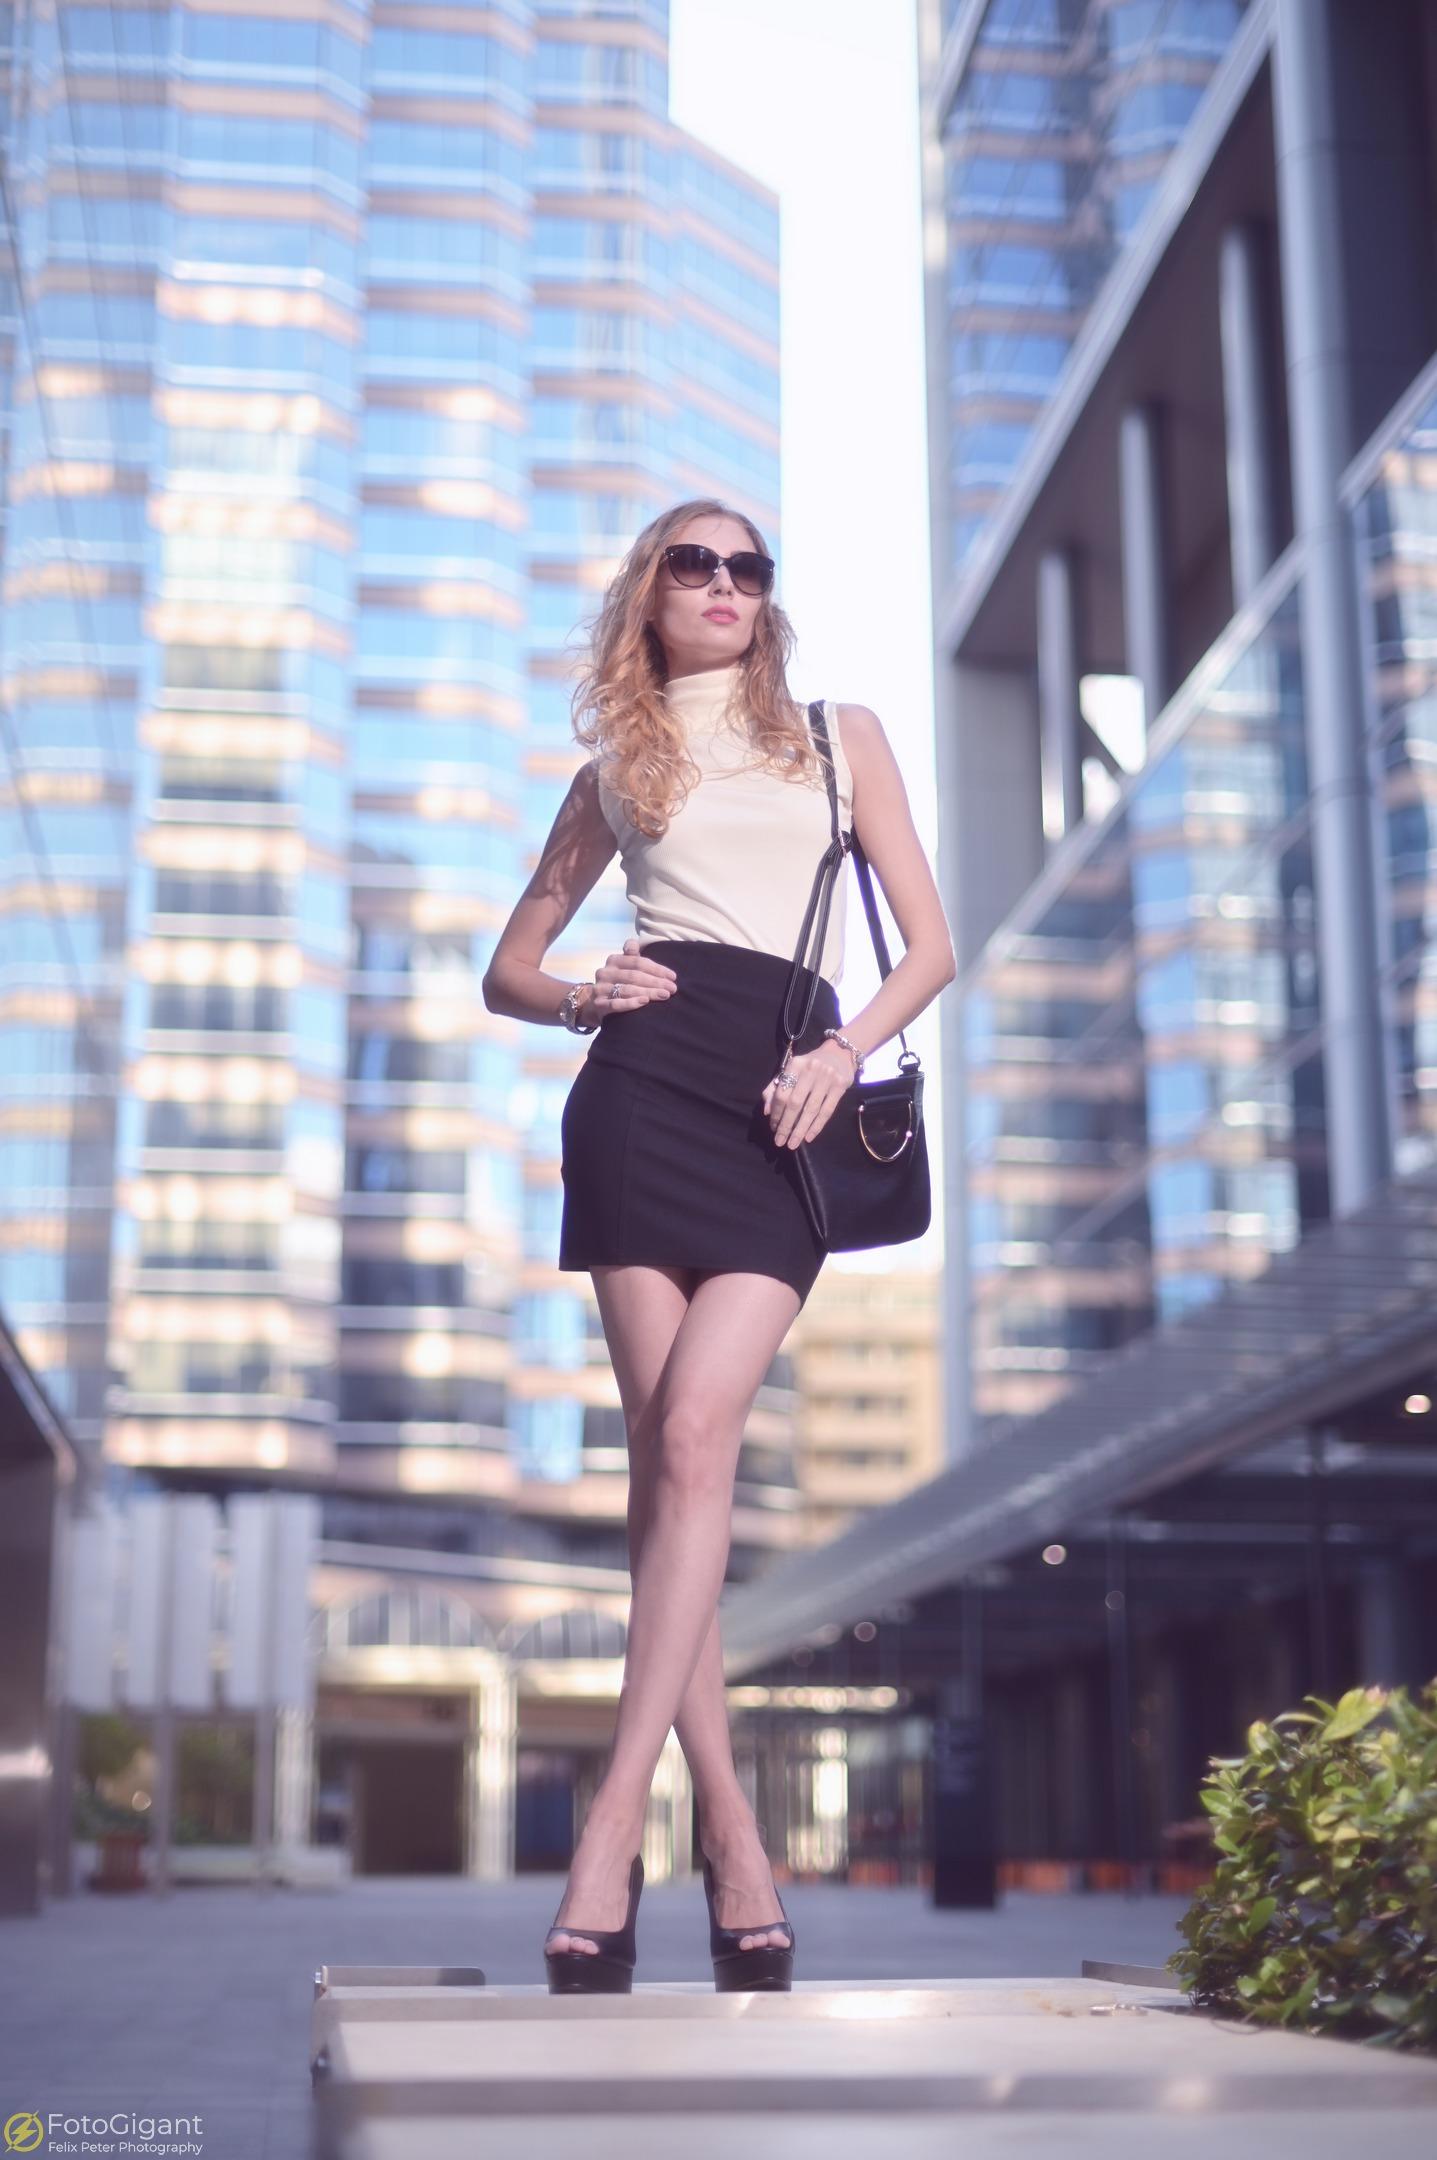 Alina_Fashion-Photography_Perth_27.jpg